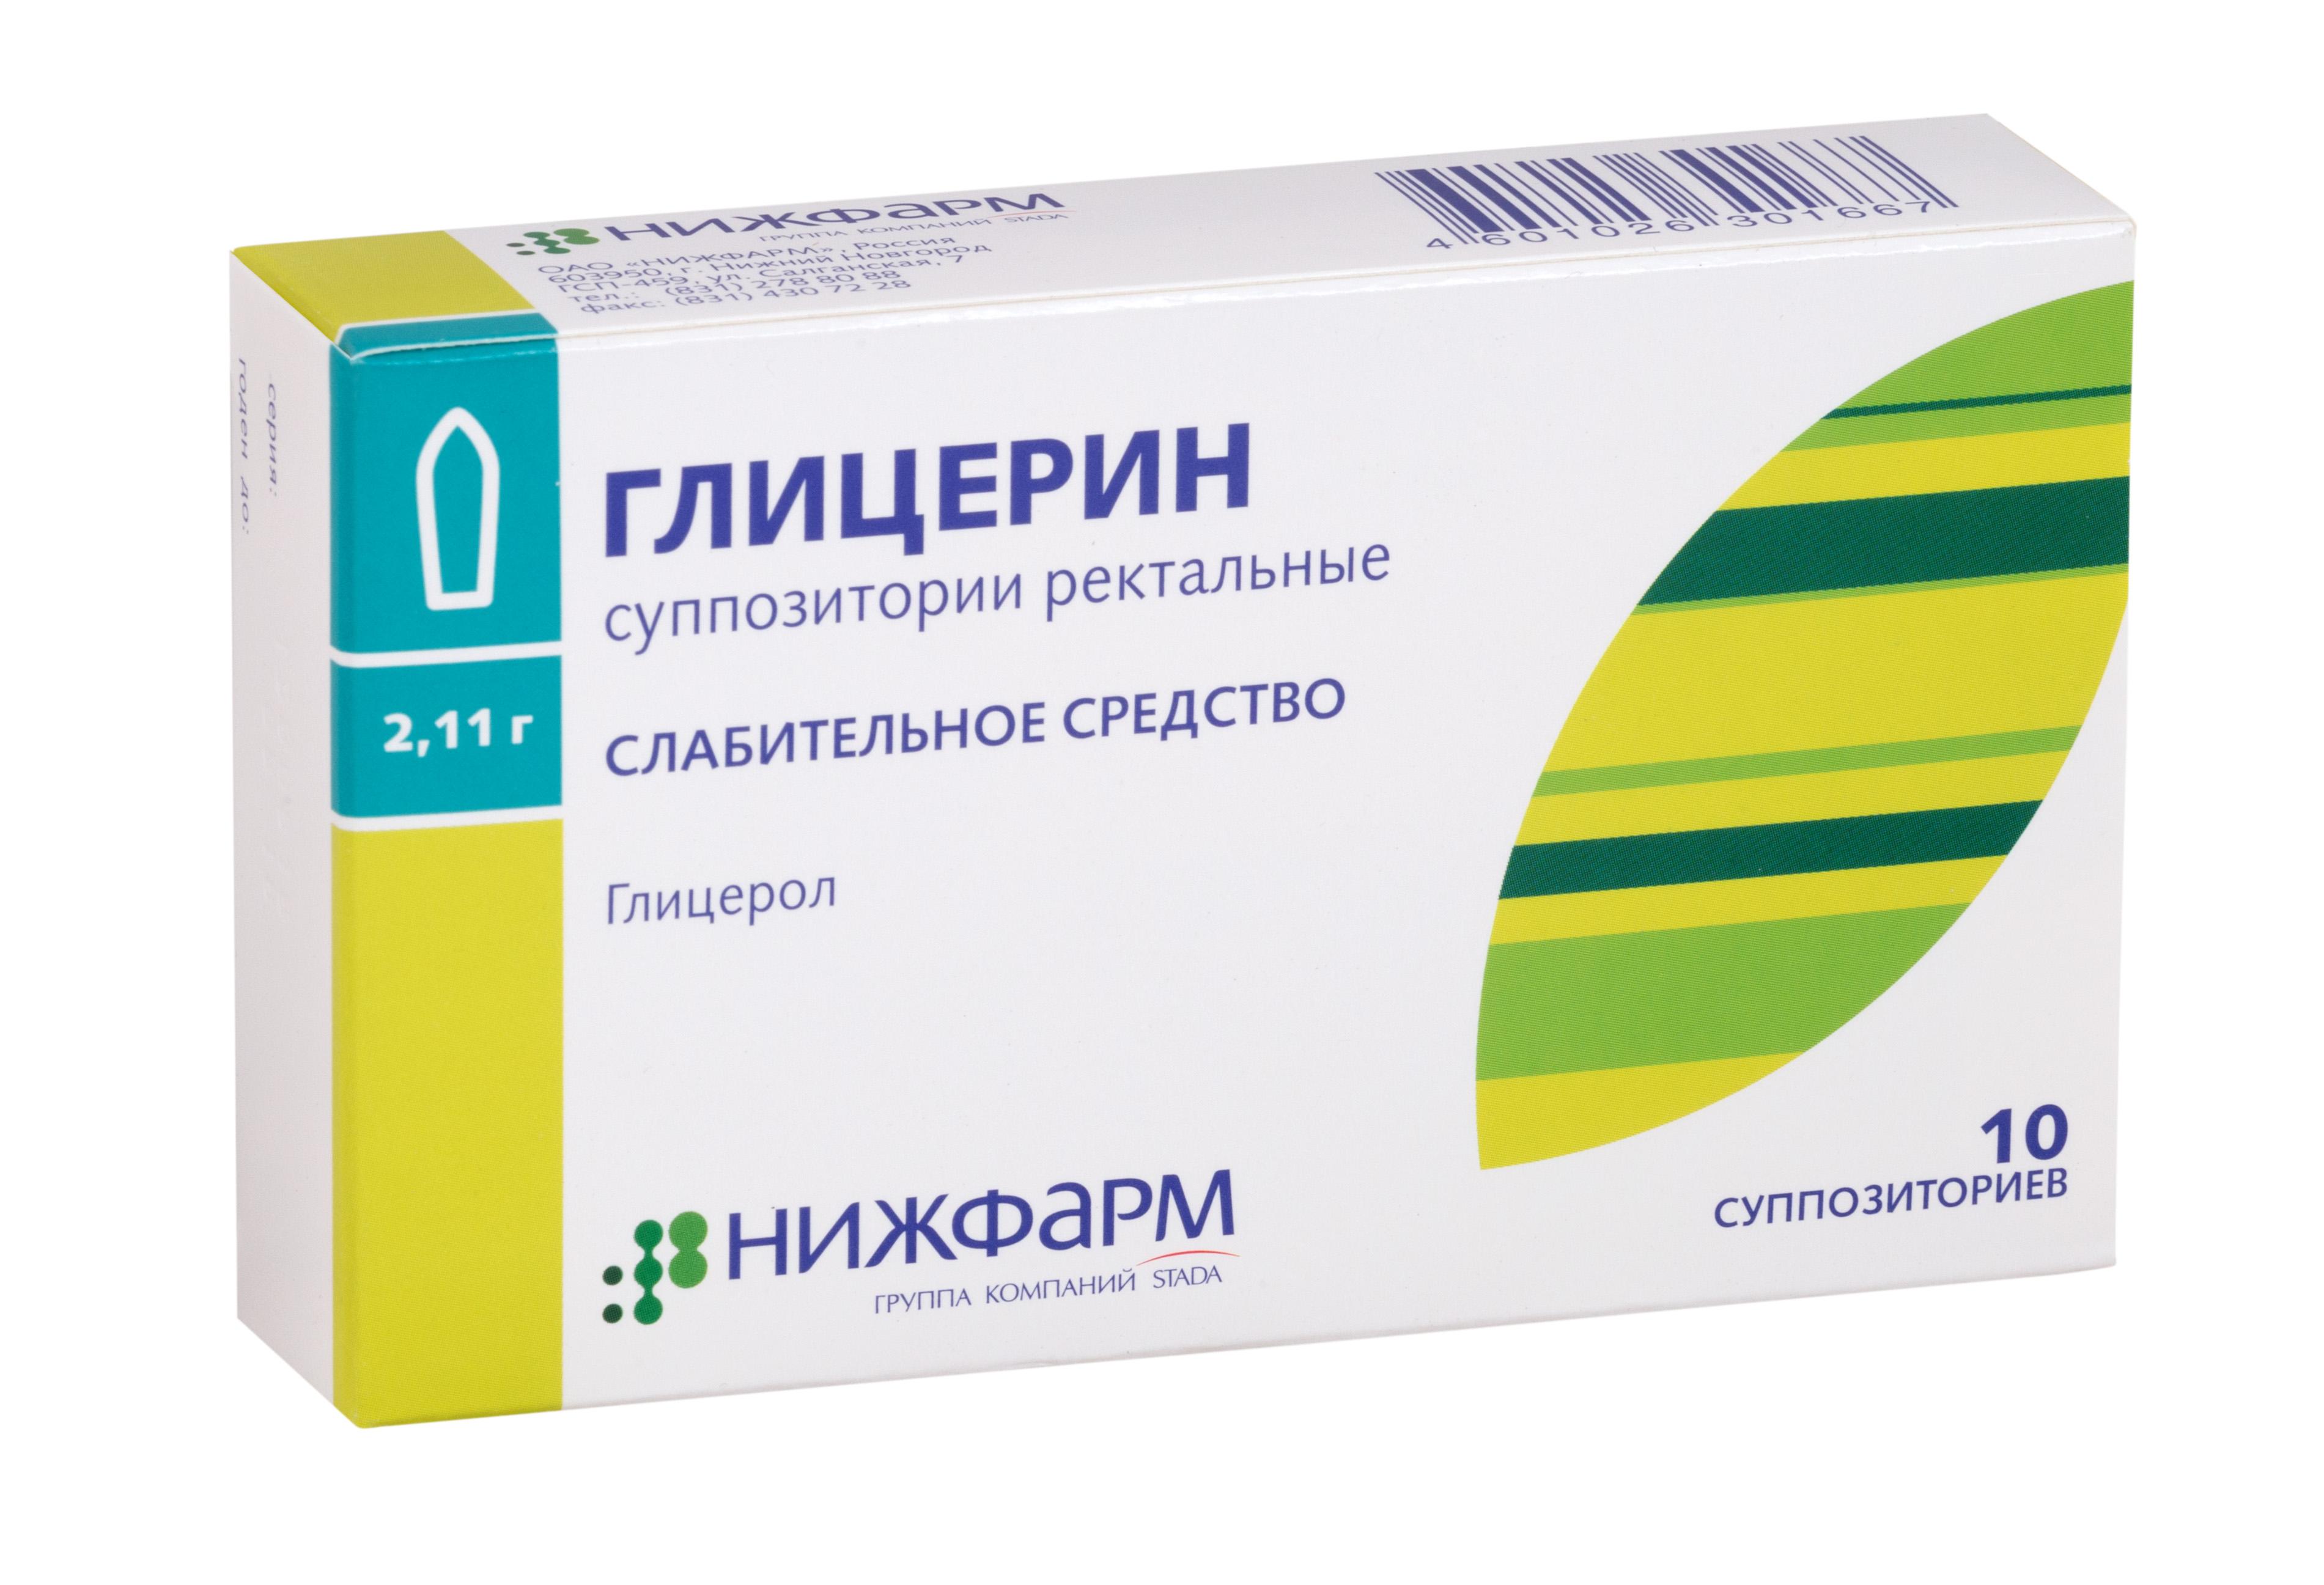 Глицерин супп. рект. 2,11г n10